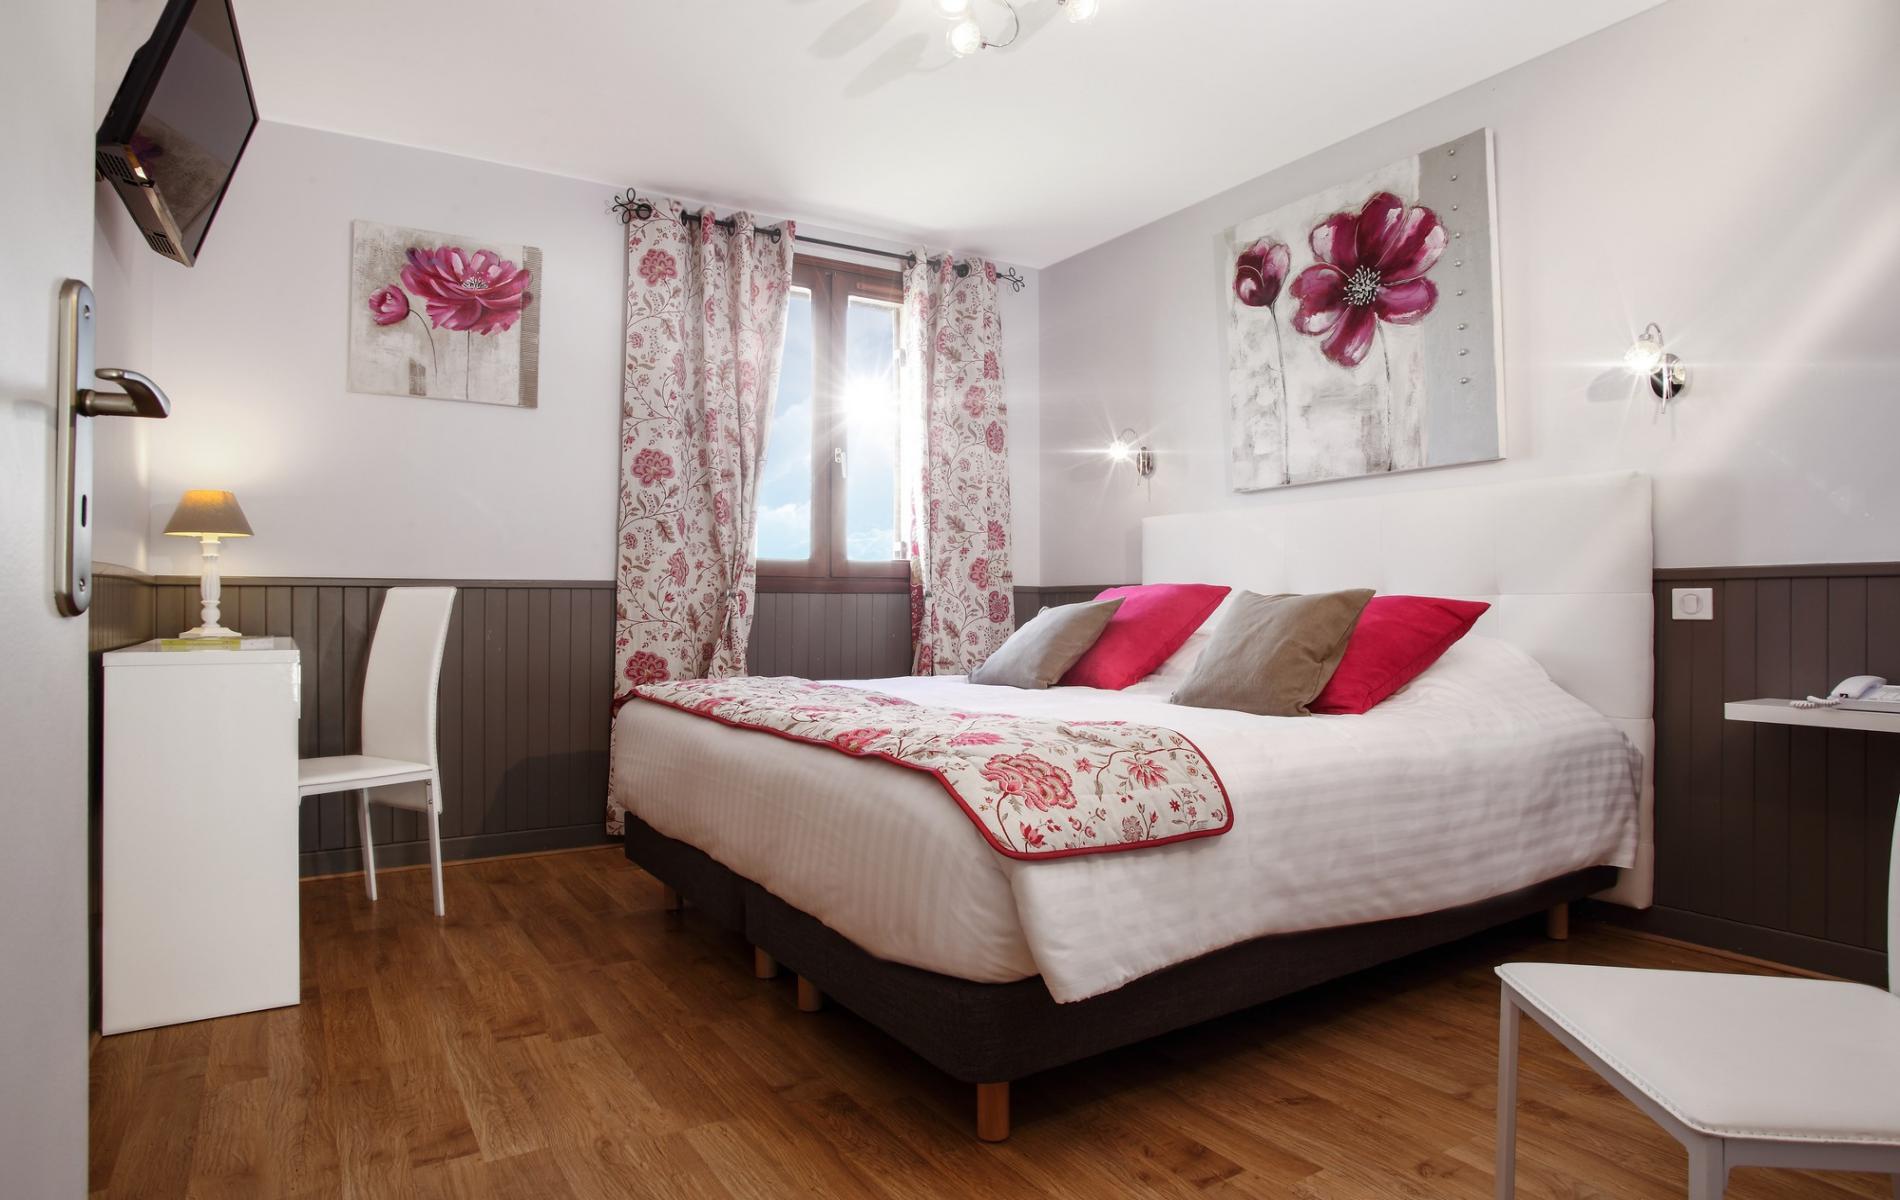 Chambres hotel de charme sarlat le domaine de la rhonie for Chambre de charme dordogne